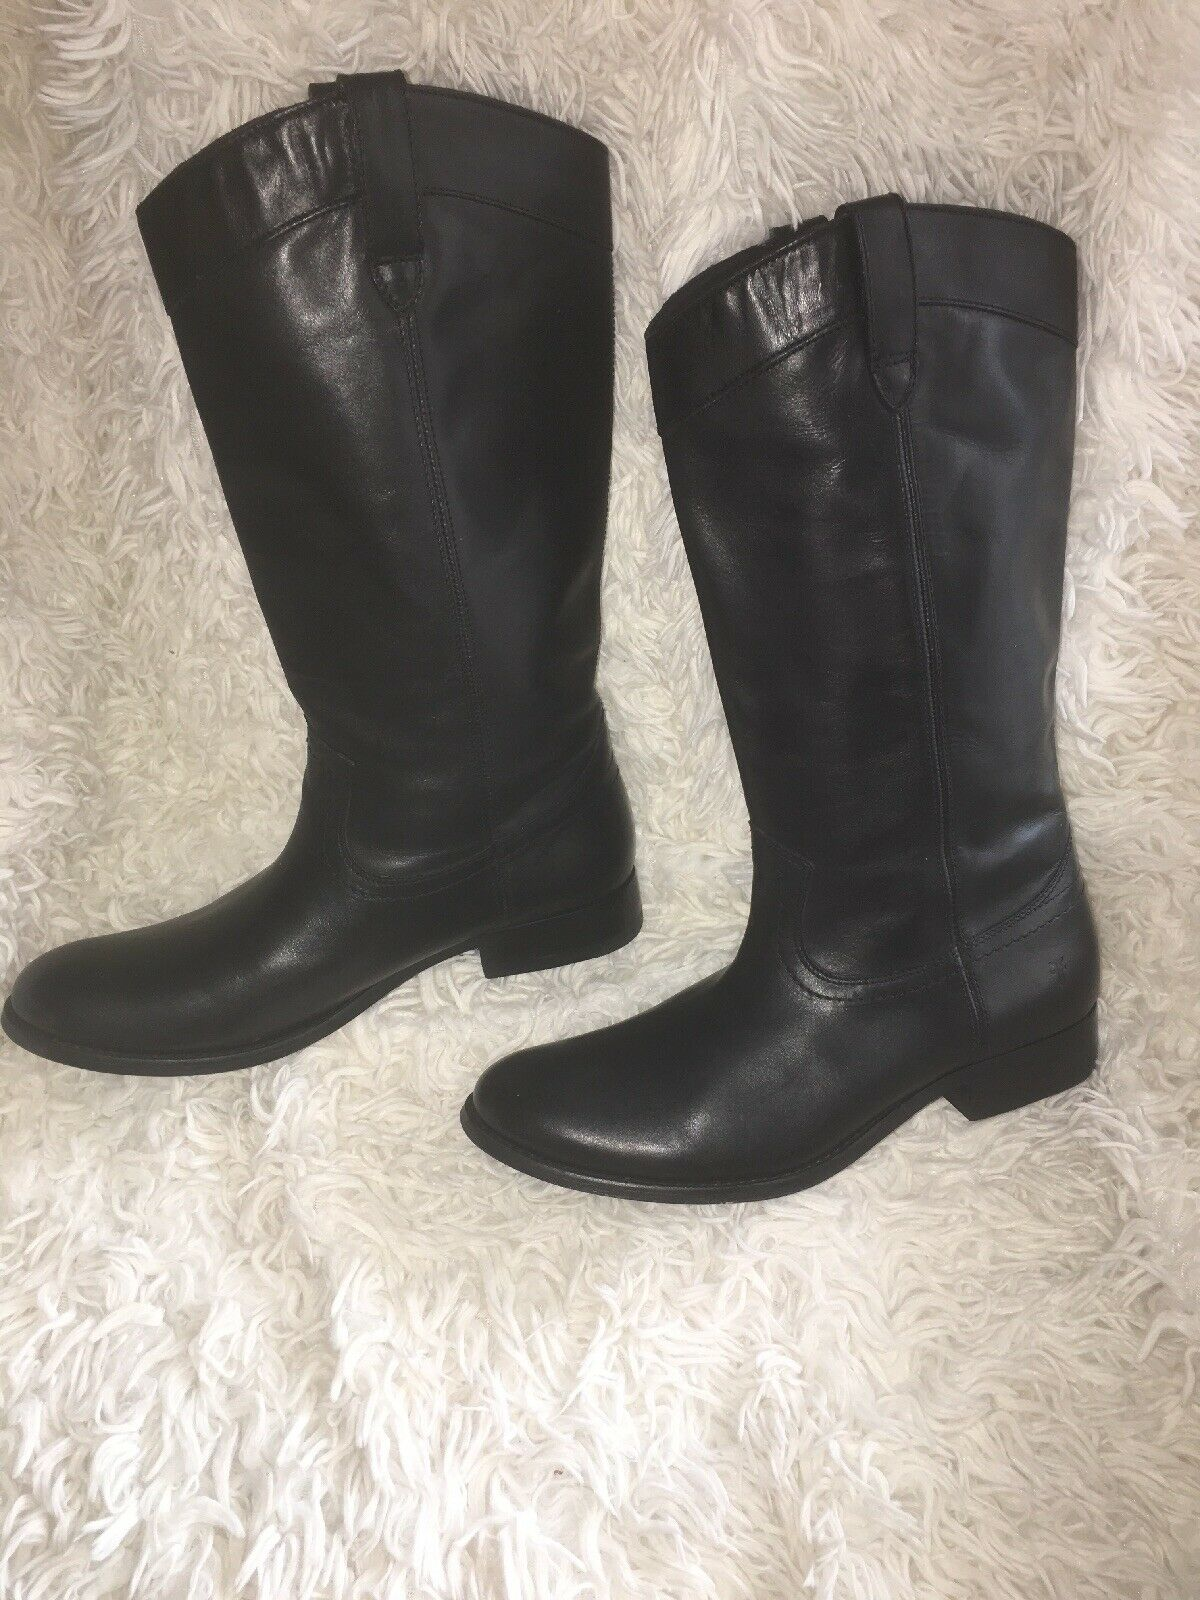 Frye Black Leather Melissa Pull On Round Toe Boot 3471447 sz 8 b new